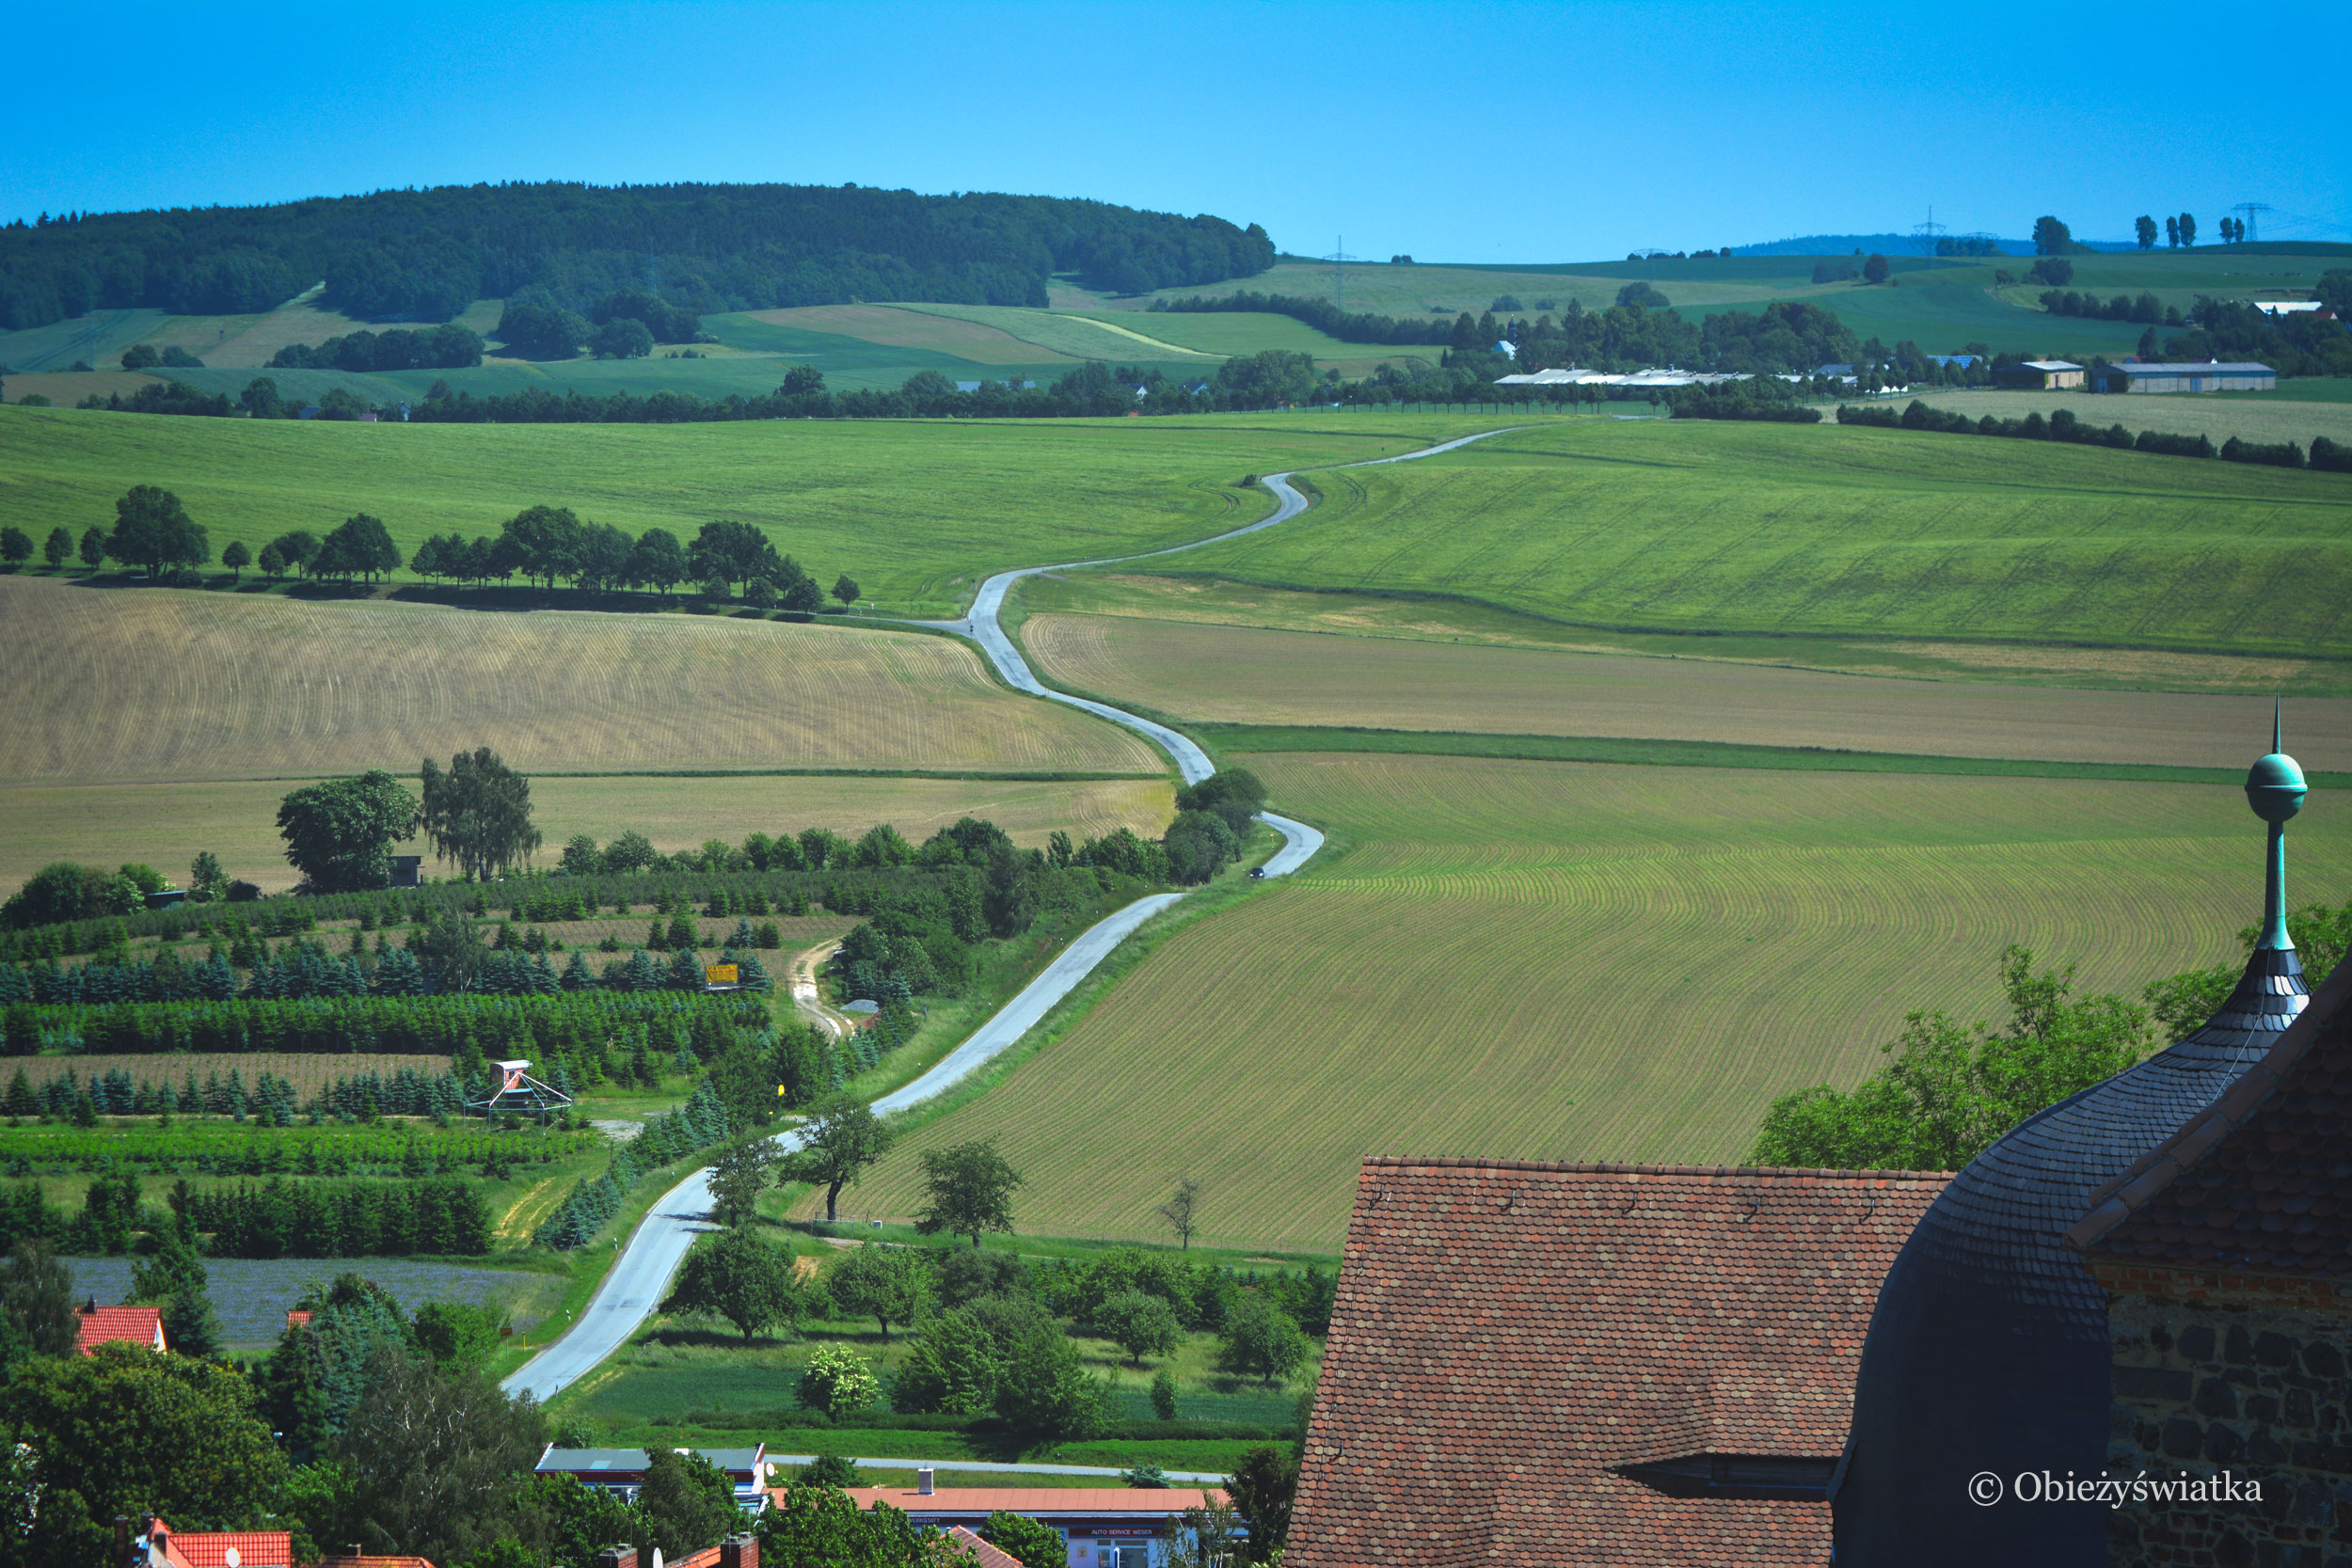 Widok z zamku Stolpen na okolicę